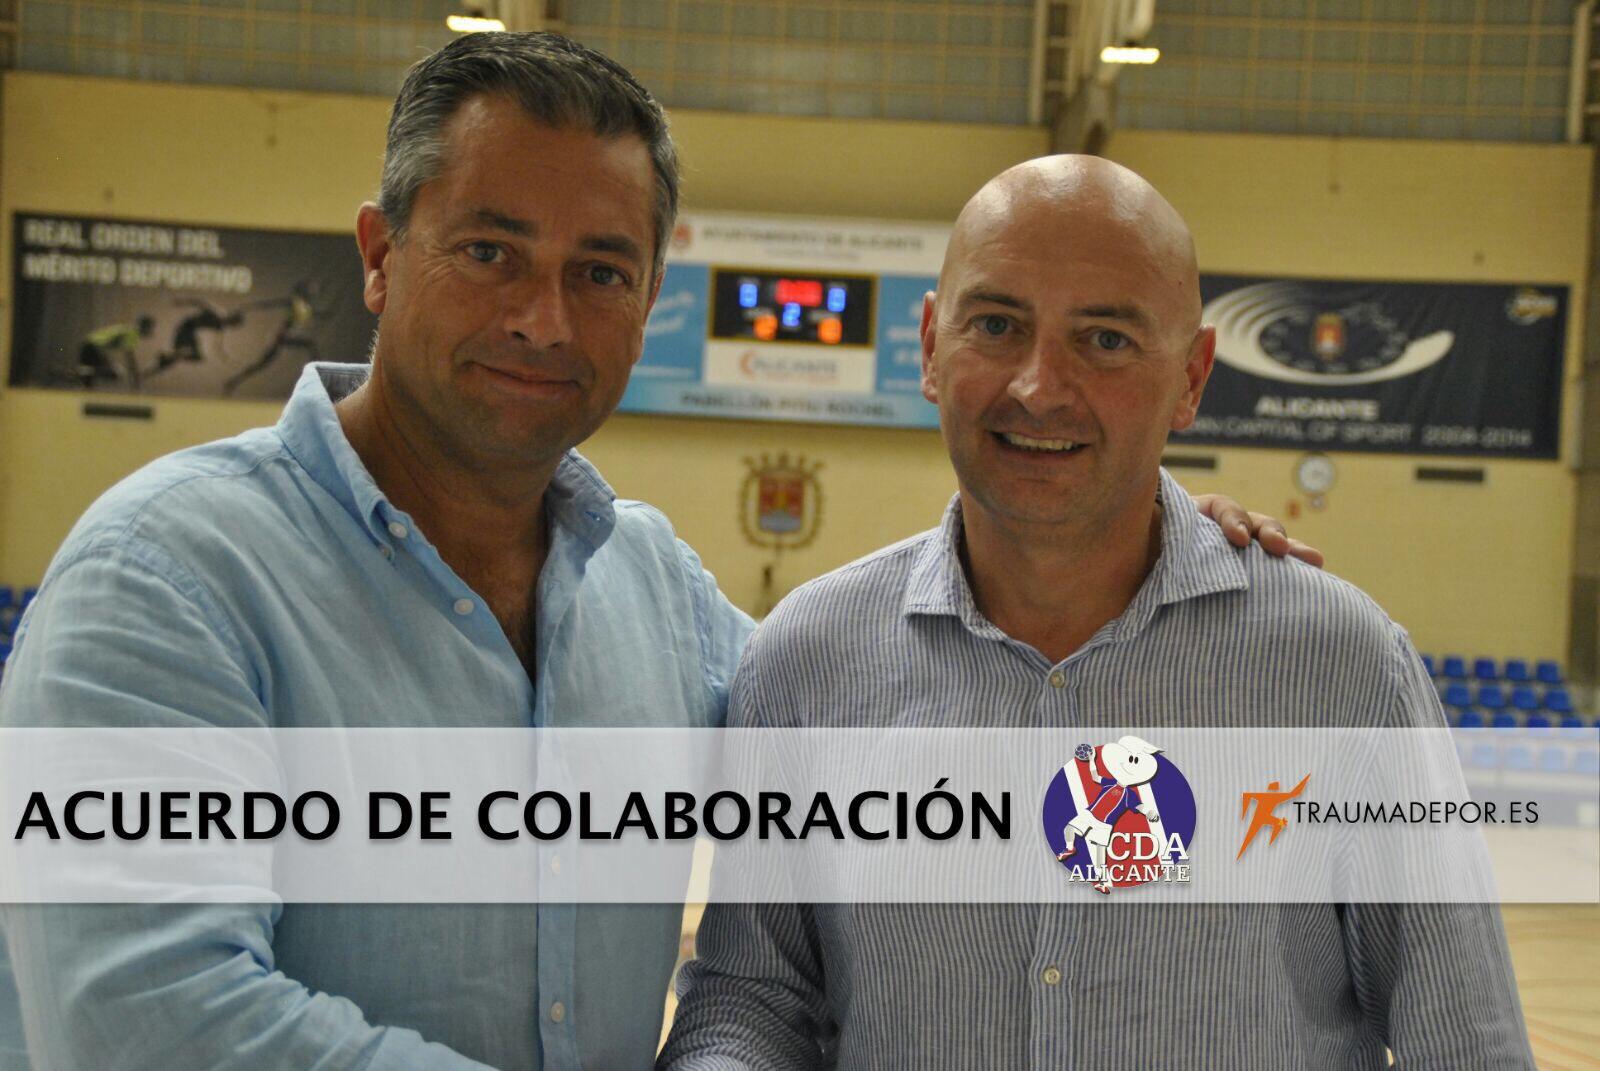 acuerdo-colaboracion-traumadepor-cd-agustinos-alicante